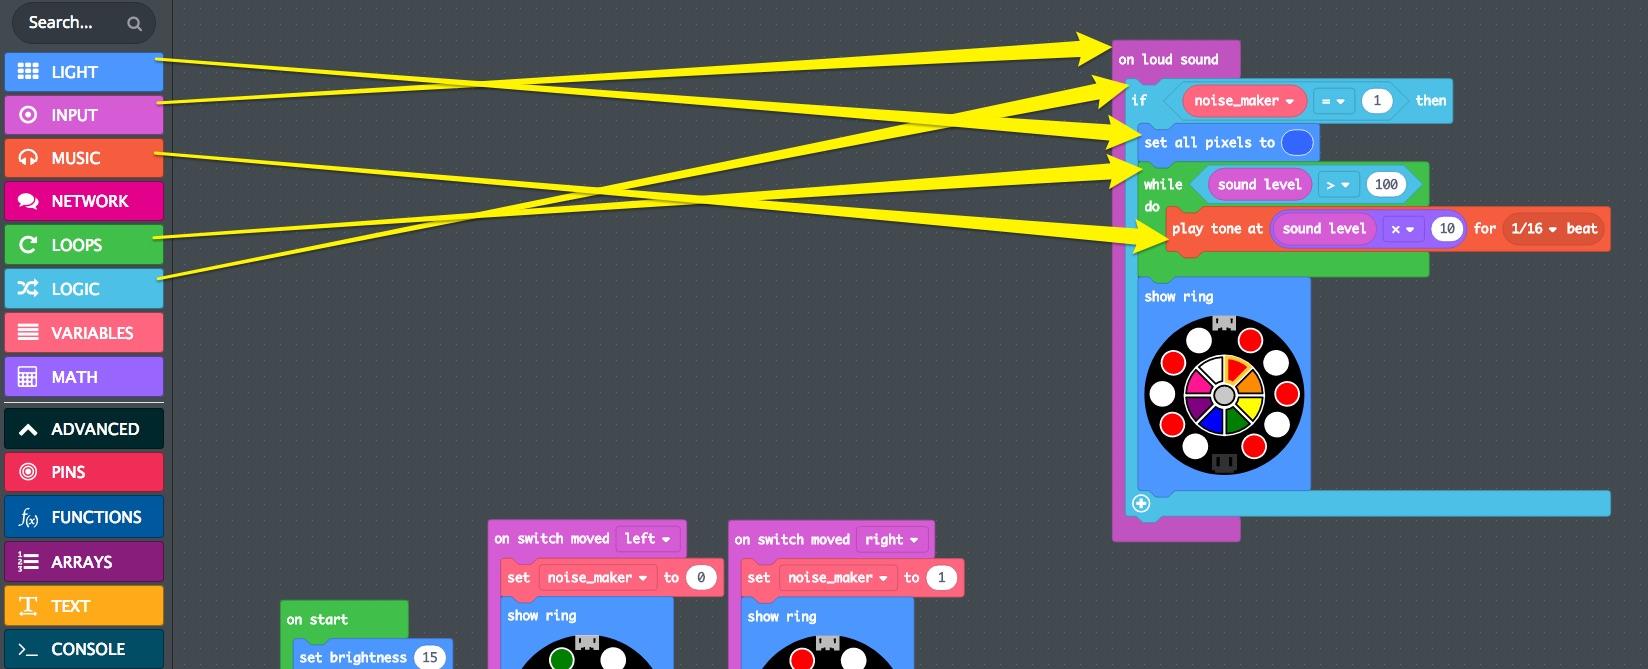 makecode_NYE_Clock_-_Adafruit_Circuit_Playground_Express_6.jpg